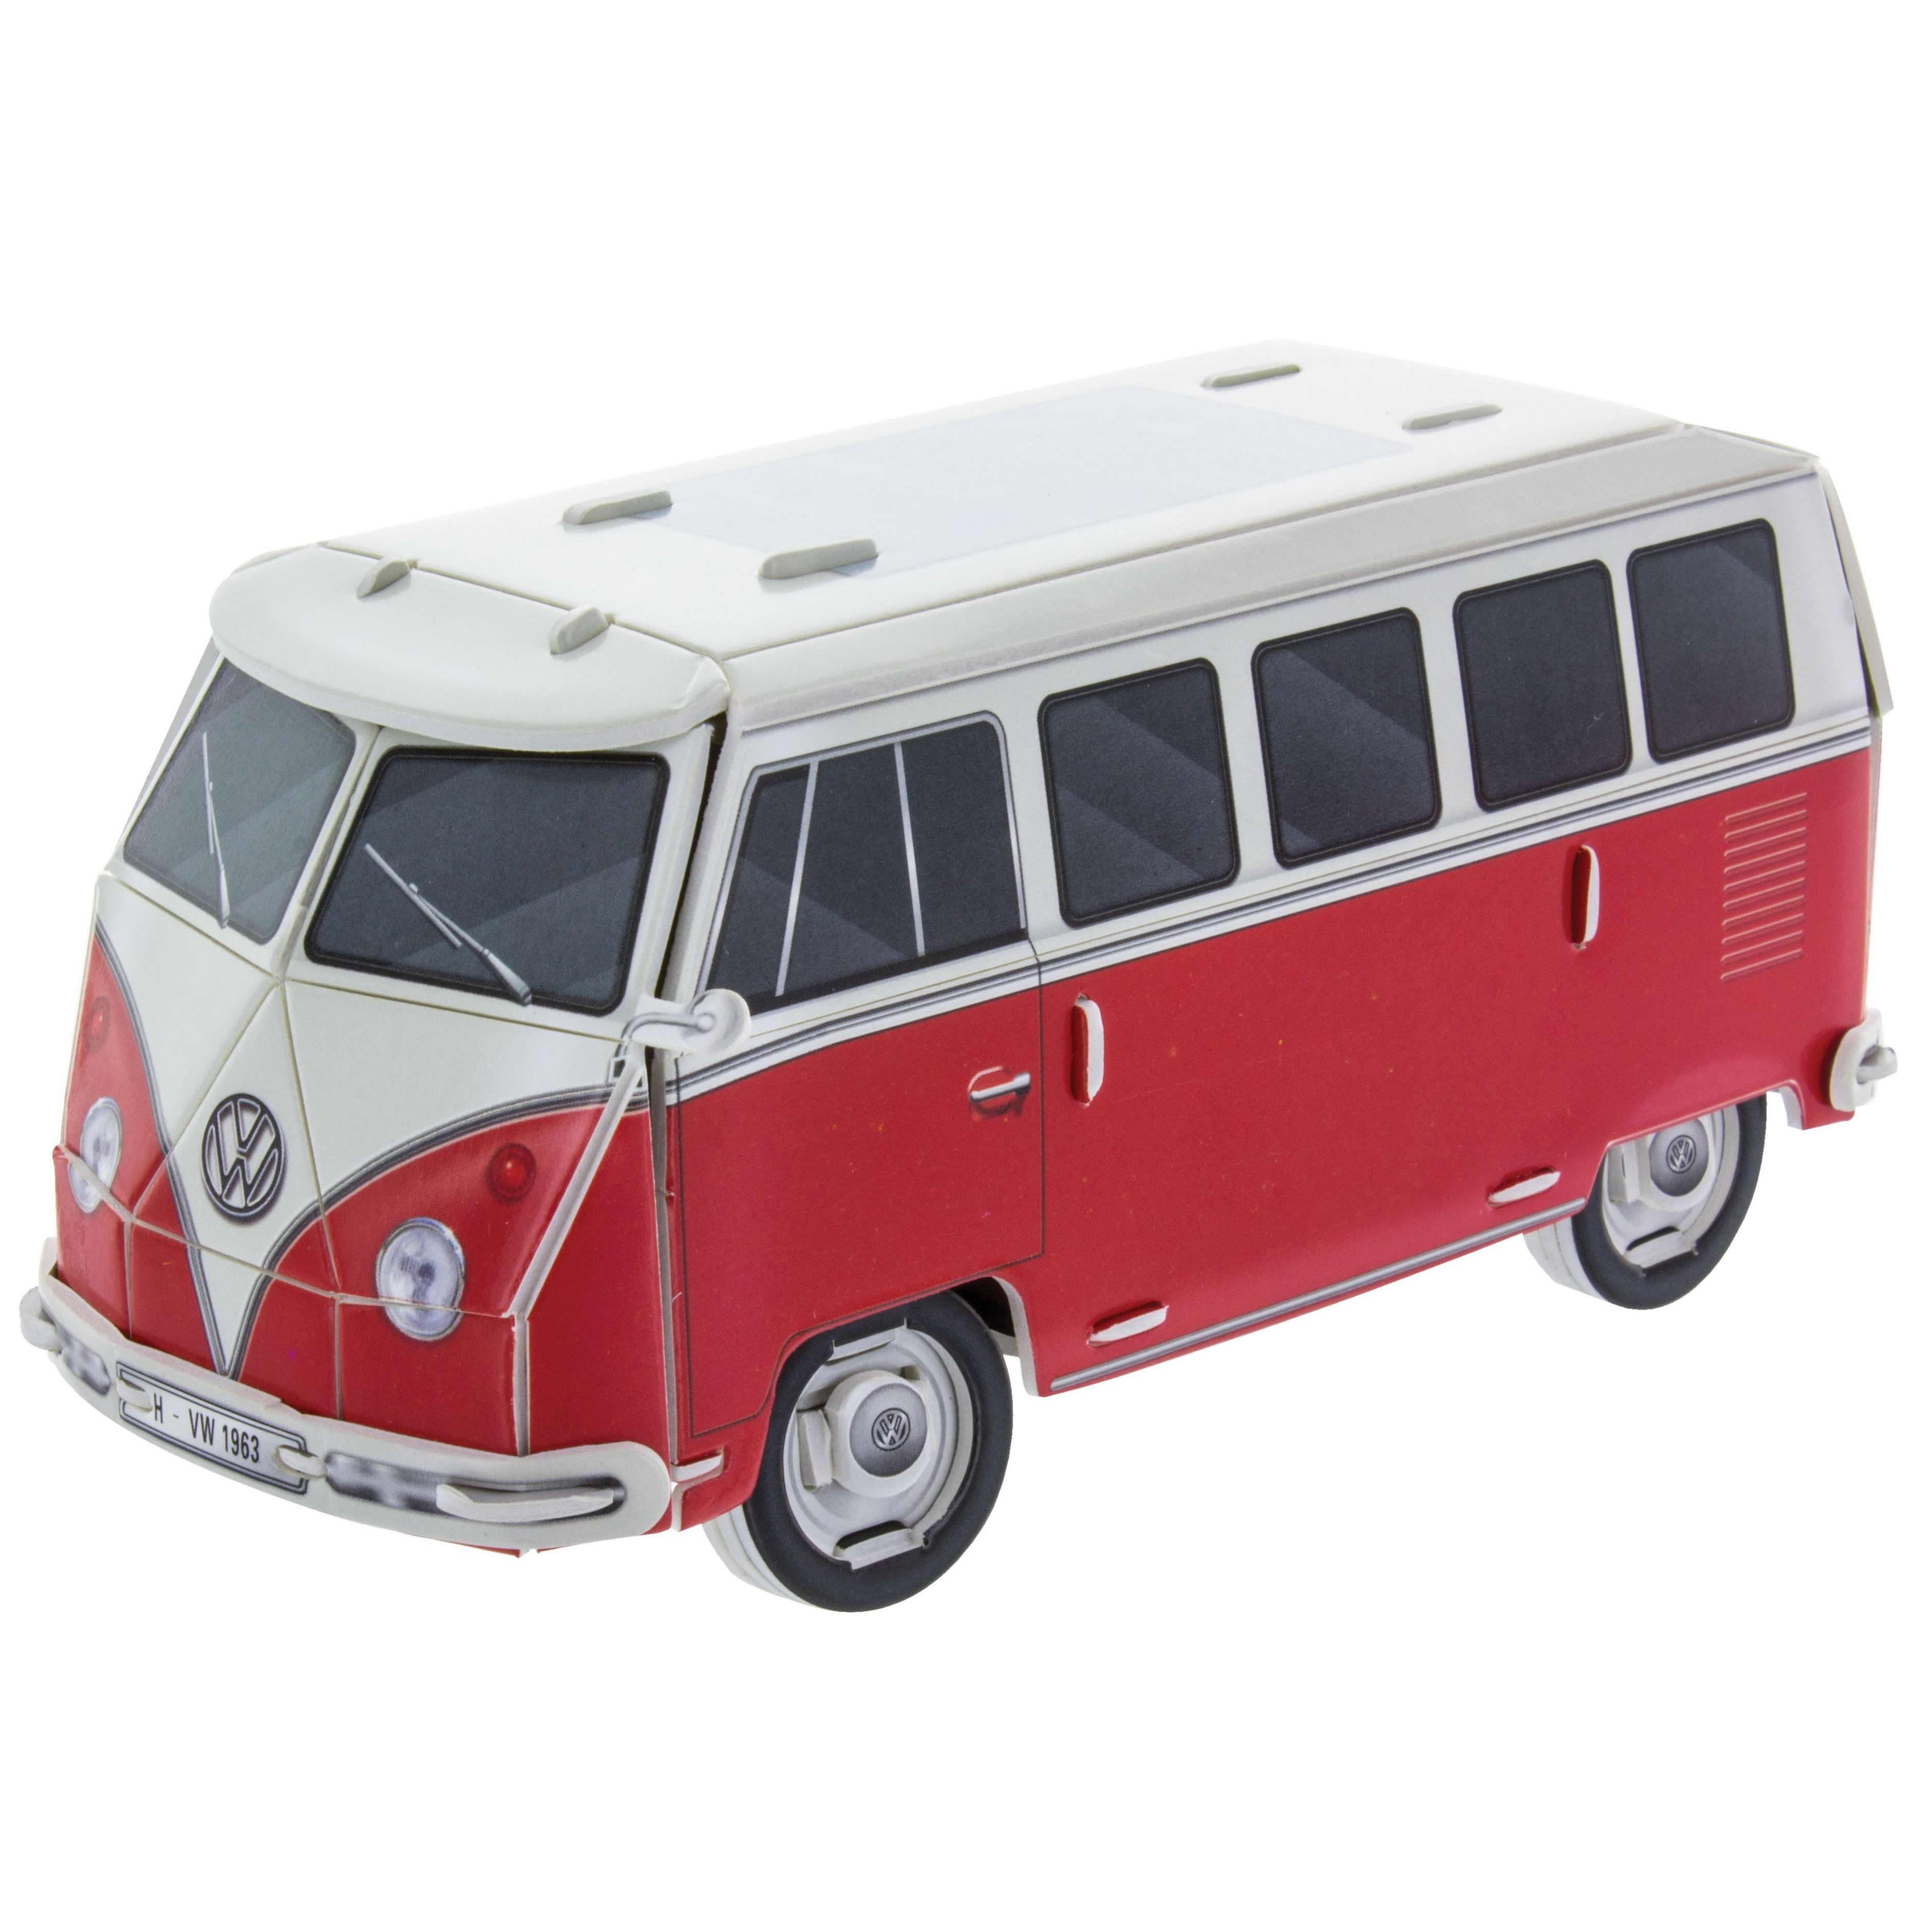 official vw camper van t1 model 39 build your own 39 3d puzzle. Black Bedroom Furniture Sets. Home Design Ideas